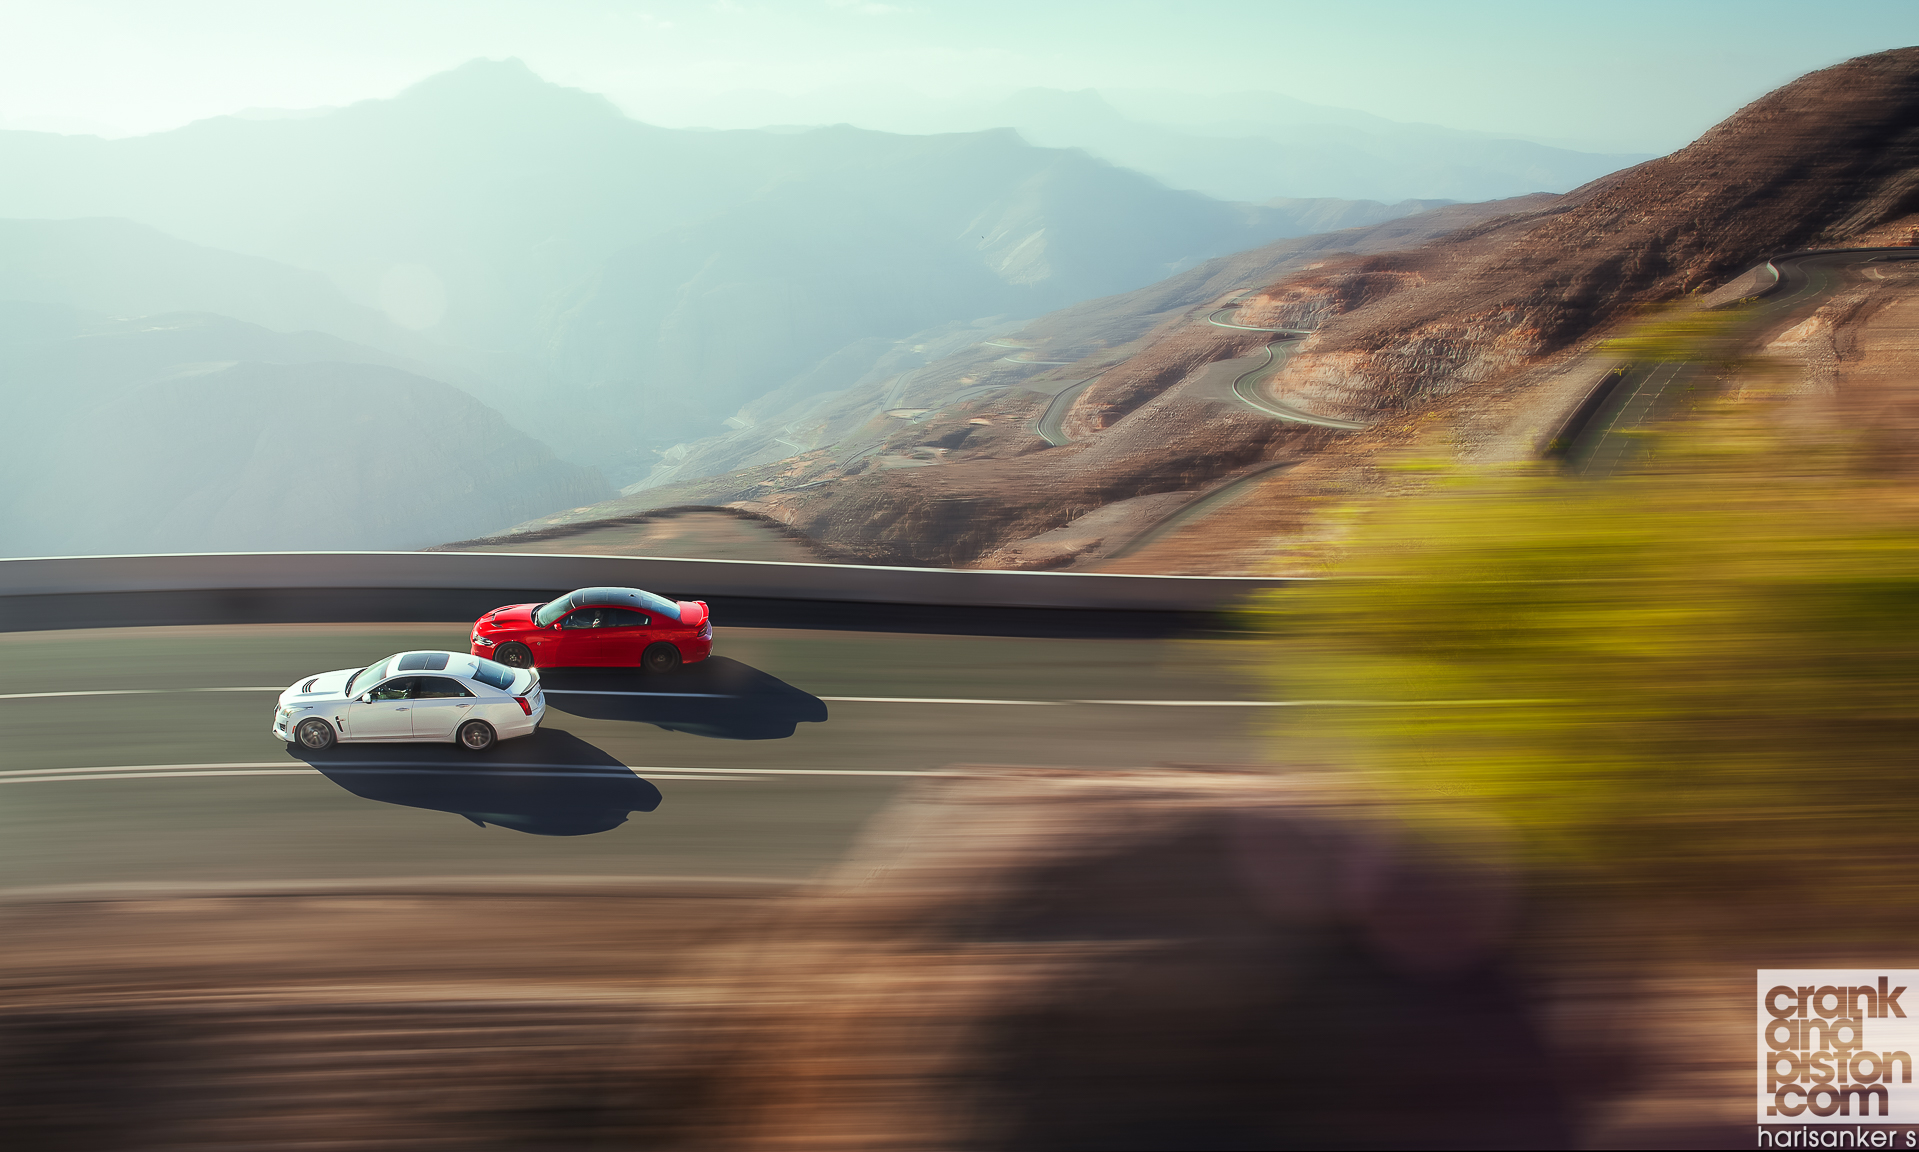 Cadillac CTS-V vs Dodge Charger SRT Hellcat WALLPAPERS crankandpiston-3